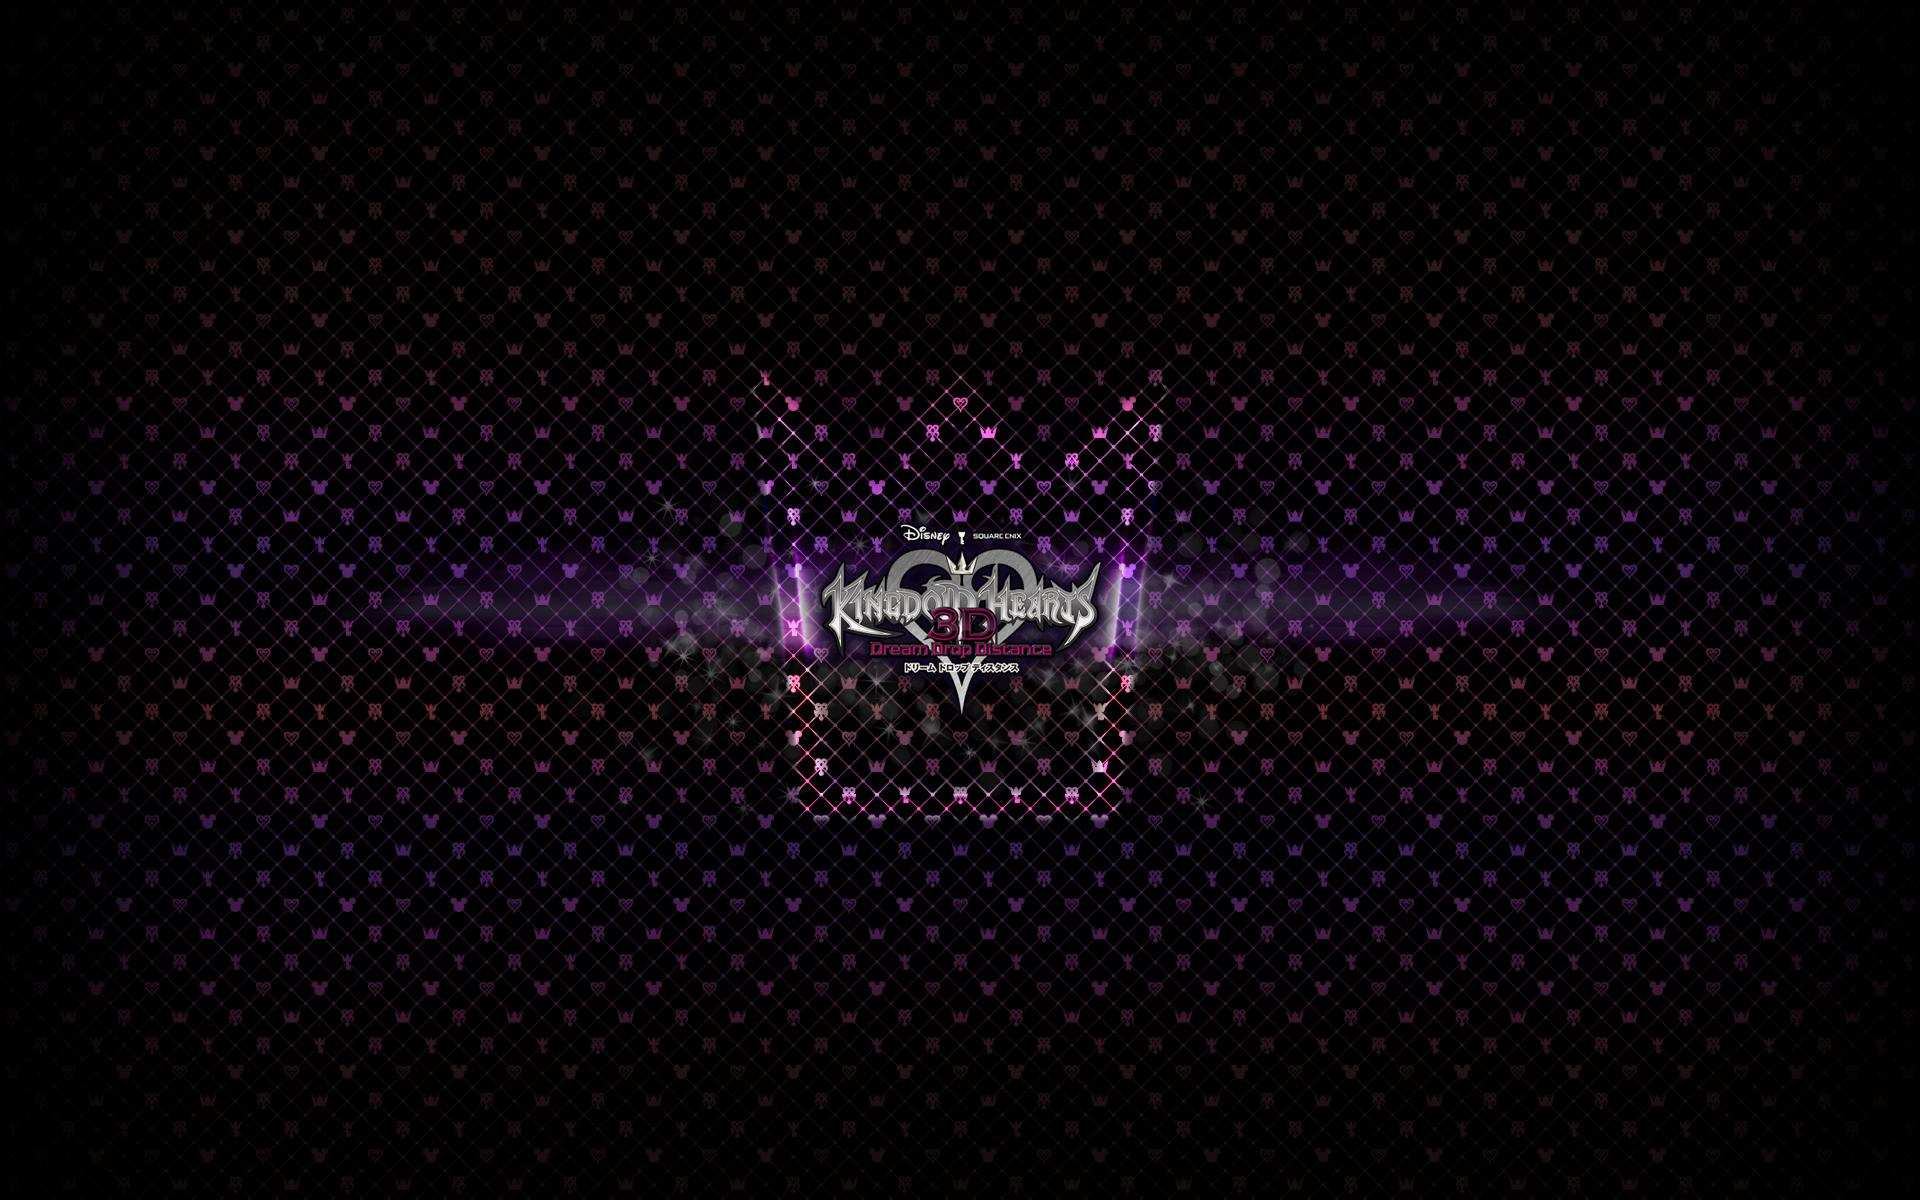 Kingdom Hearts Dream Drop Distance wallpaper by Kee naa 1920x1200